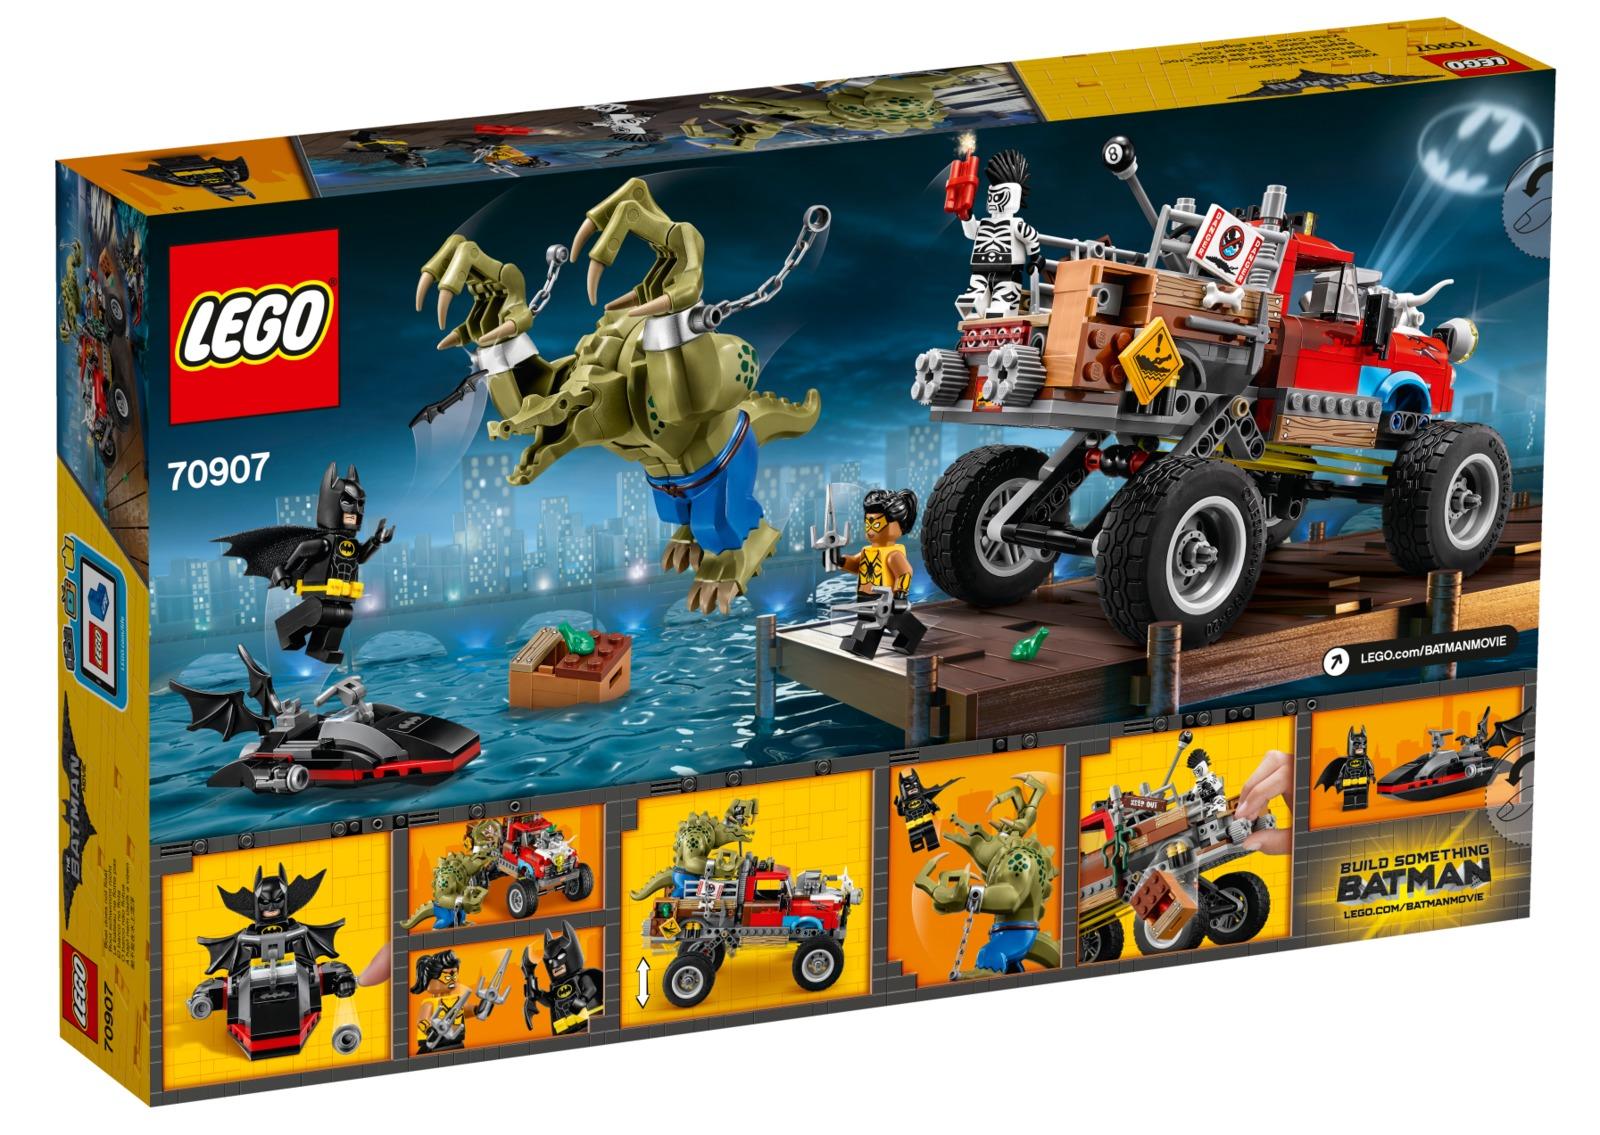 LEGO Batman Movie: Killer Croc Tail-Gator (70907) | Toy ...